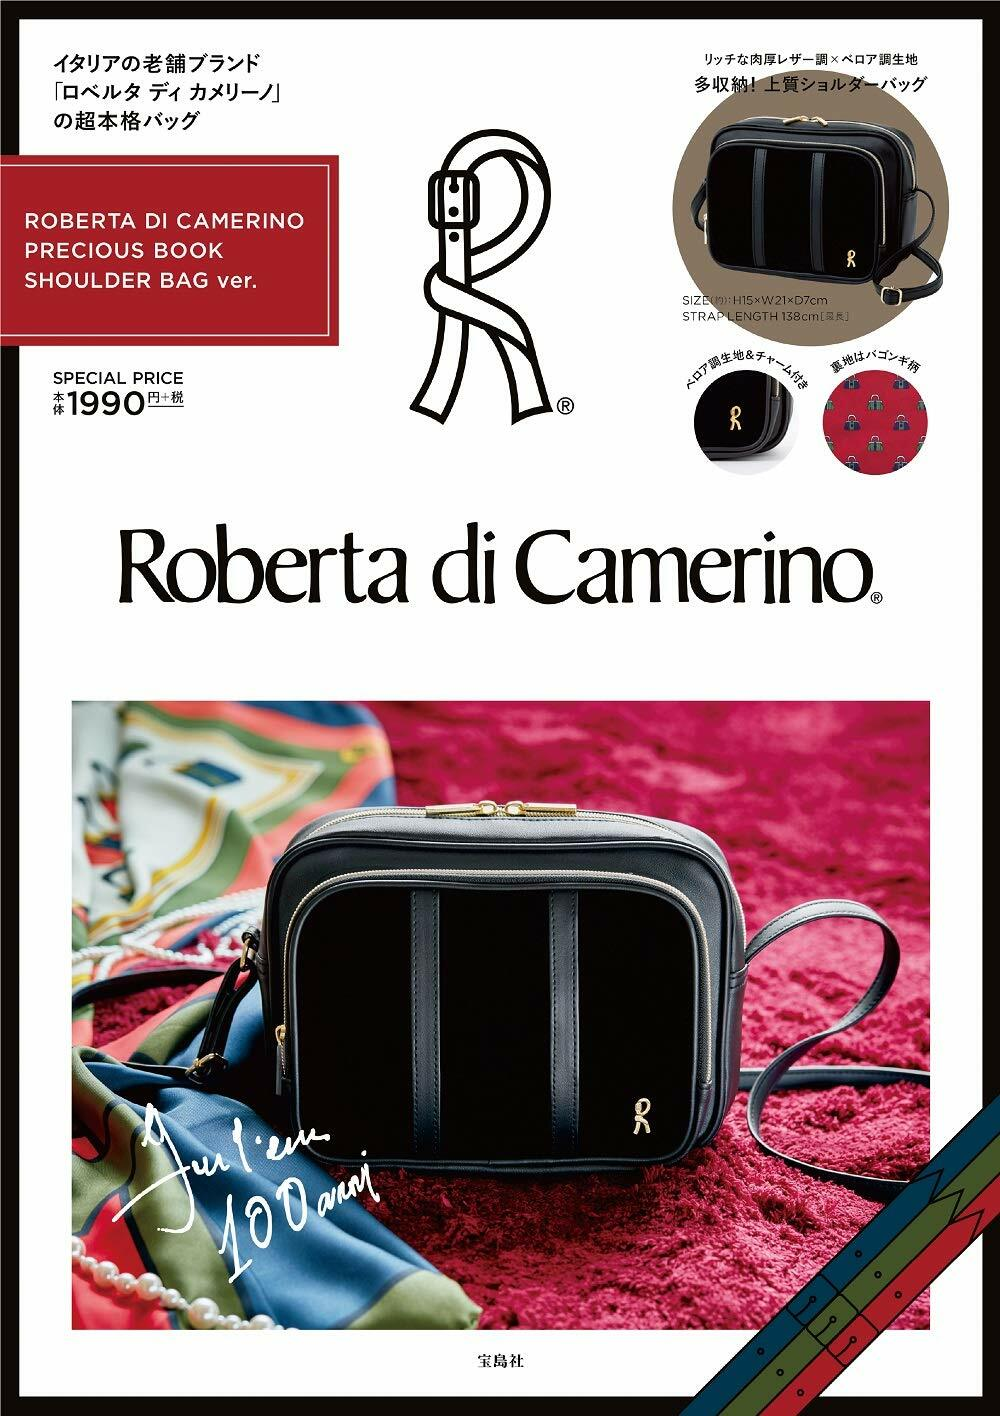 ROBERTA DI CAMERINO PRECIOUS BOOK SHOULDER BAG ver. (ブランドブック)